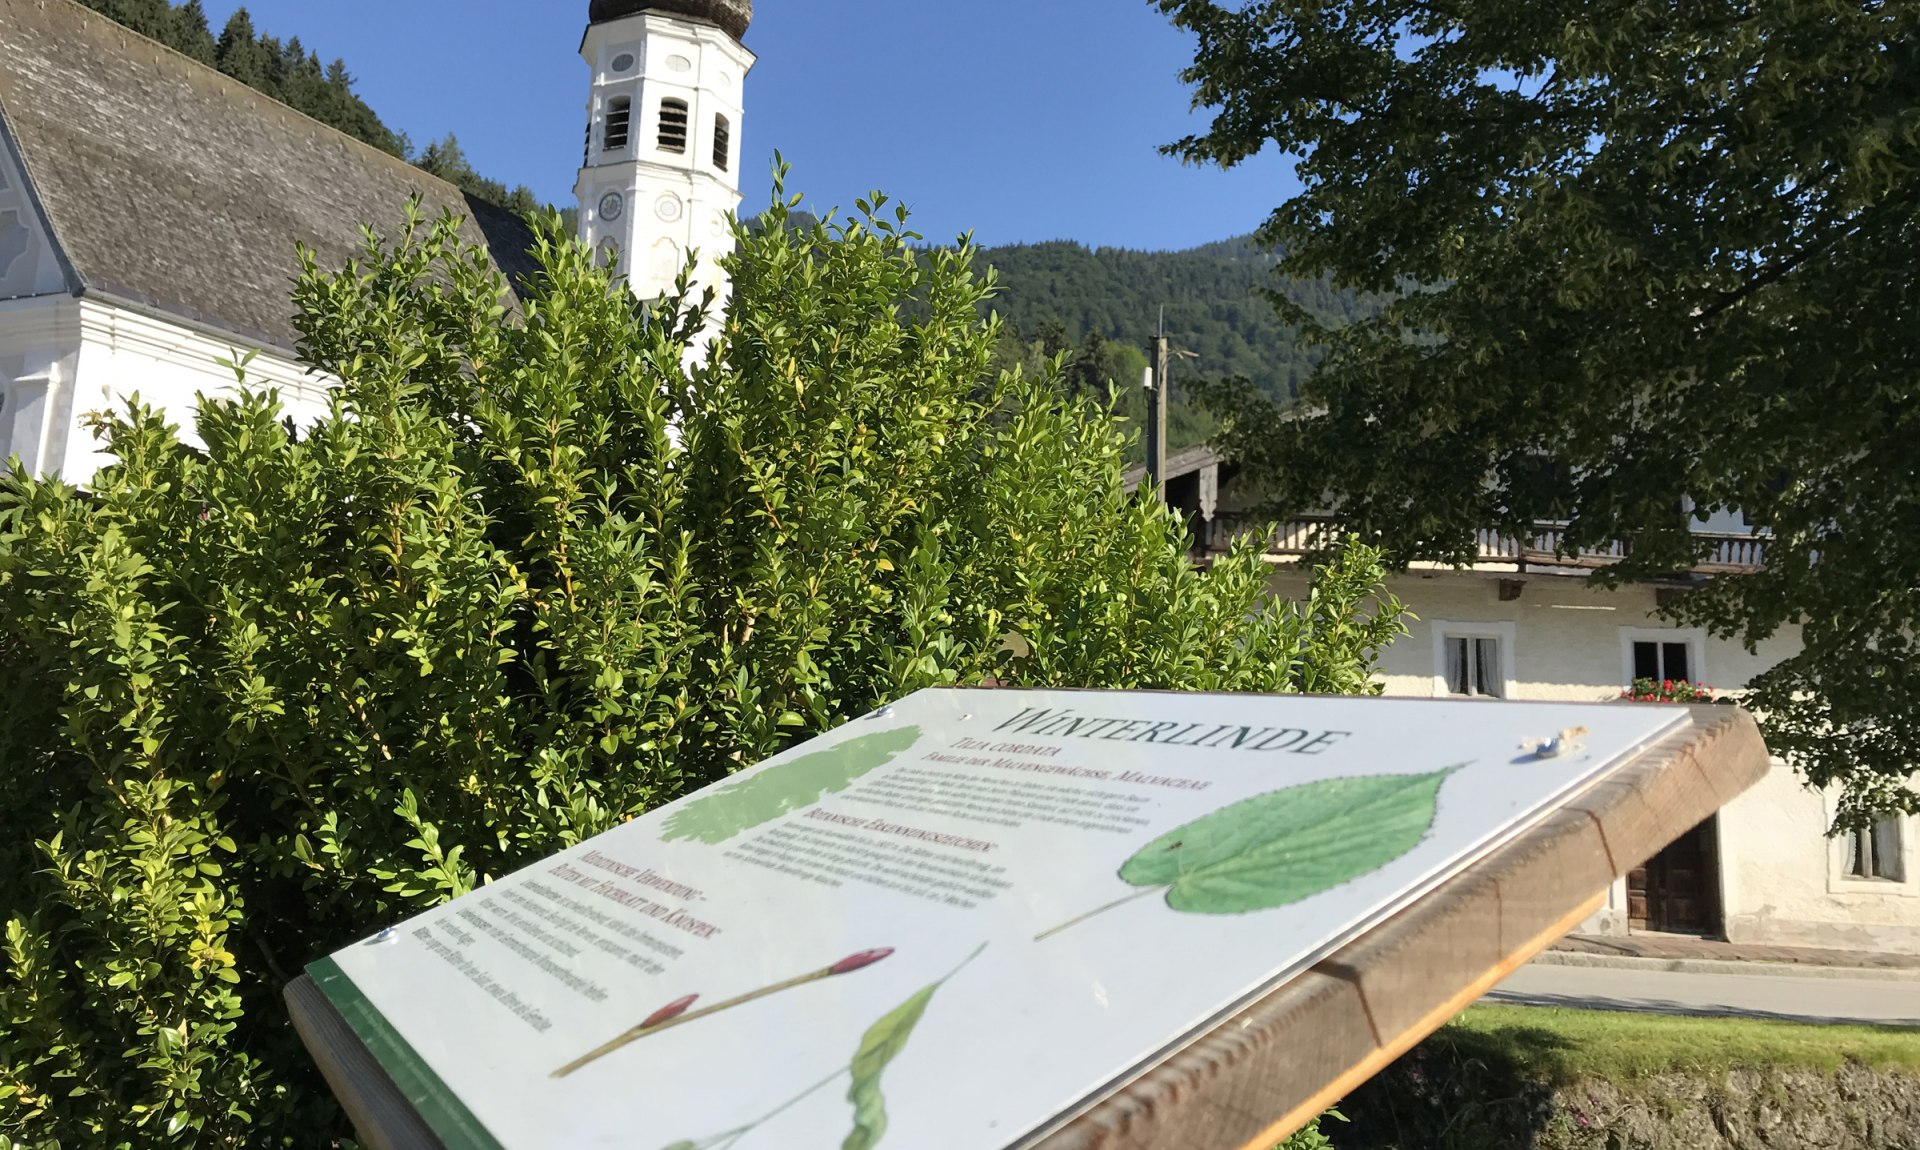 WaldApotheke Sachrang - Winterlinde an der Kirche, © Tourist Info Aschau im Chiemgau